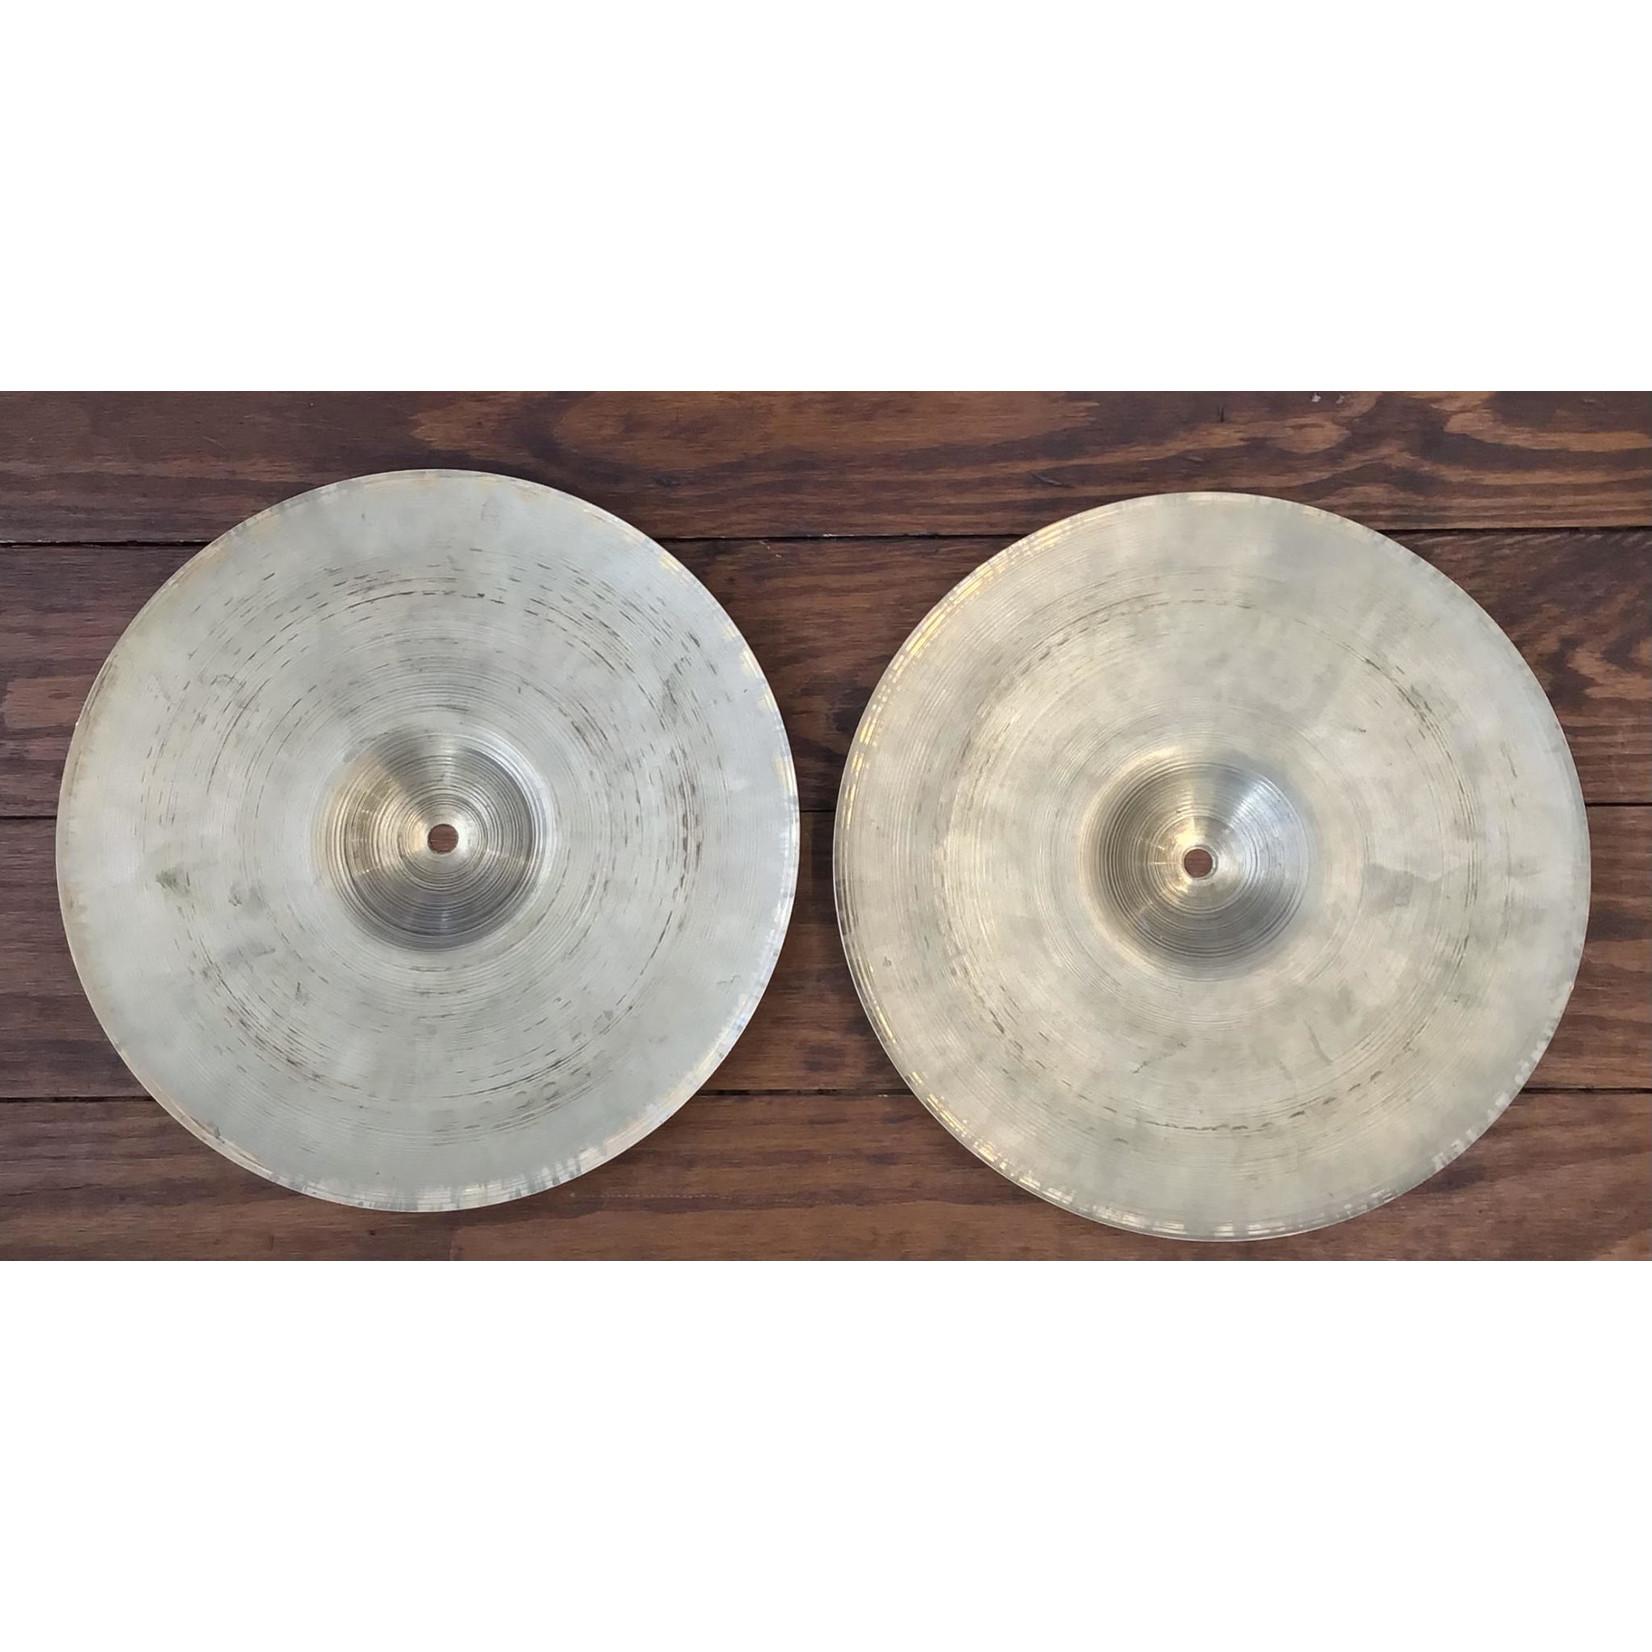 Zildjian USED Zildjian 1970's (Thin Stamp) Hi-Hat Cymbals (Pair)